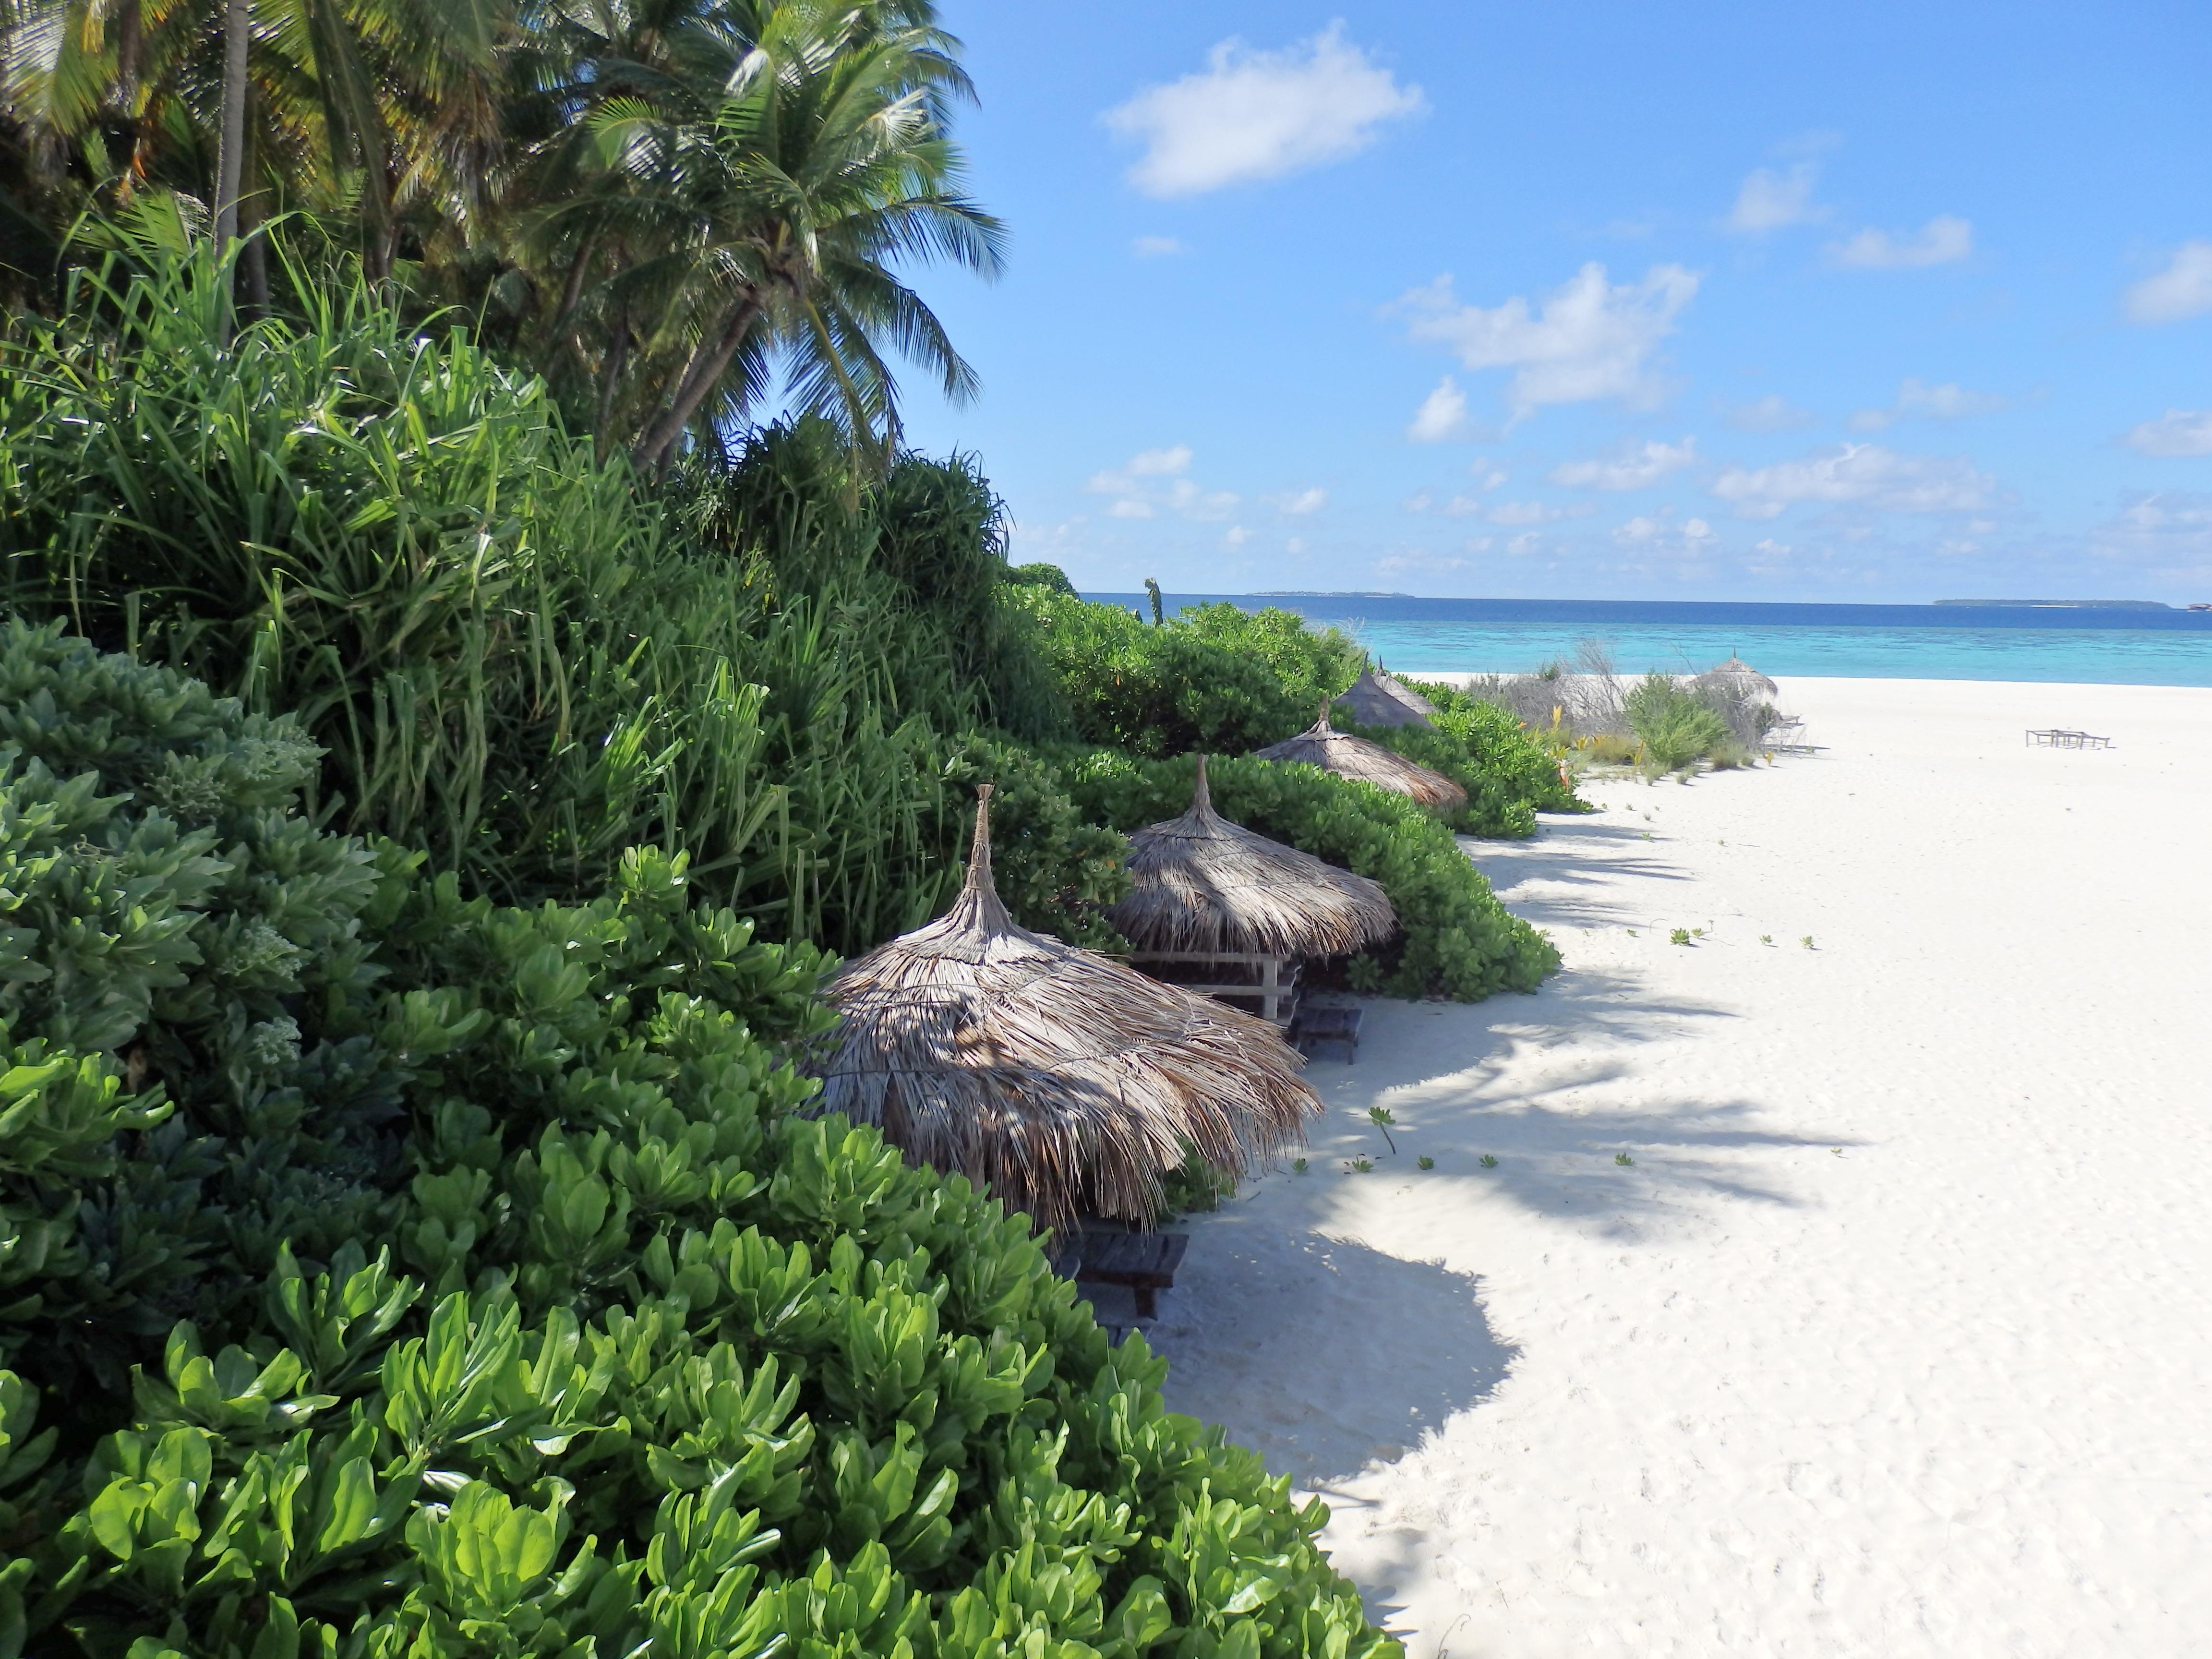 aaaVeee Nature's Paradise - ahol a természet a luxus ...